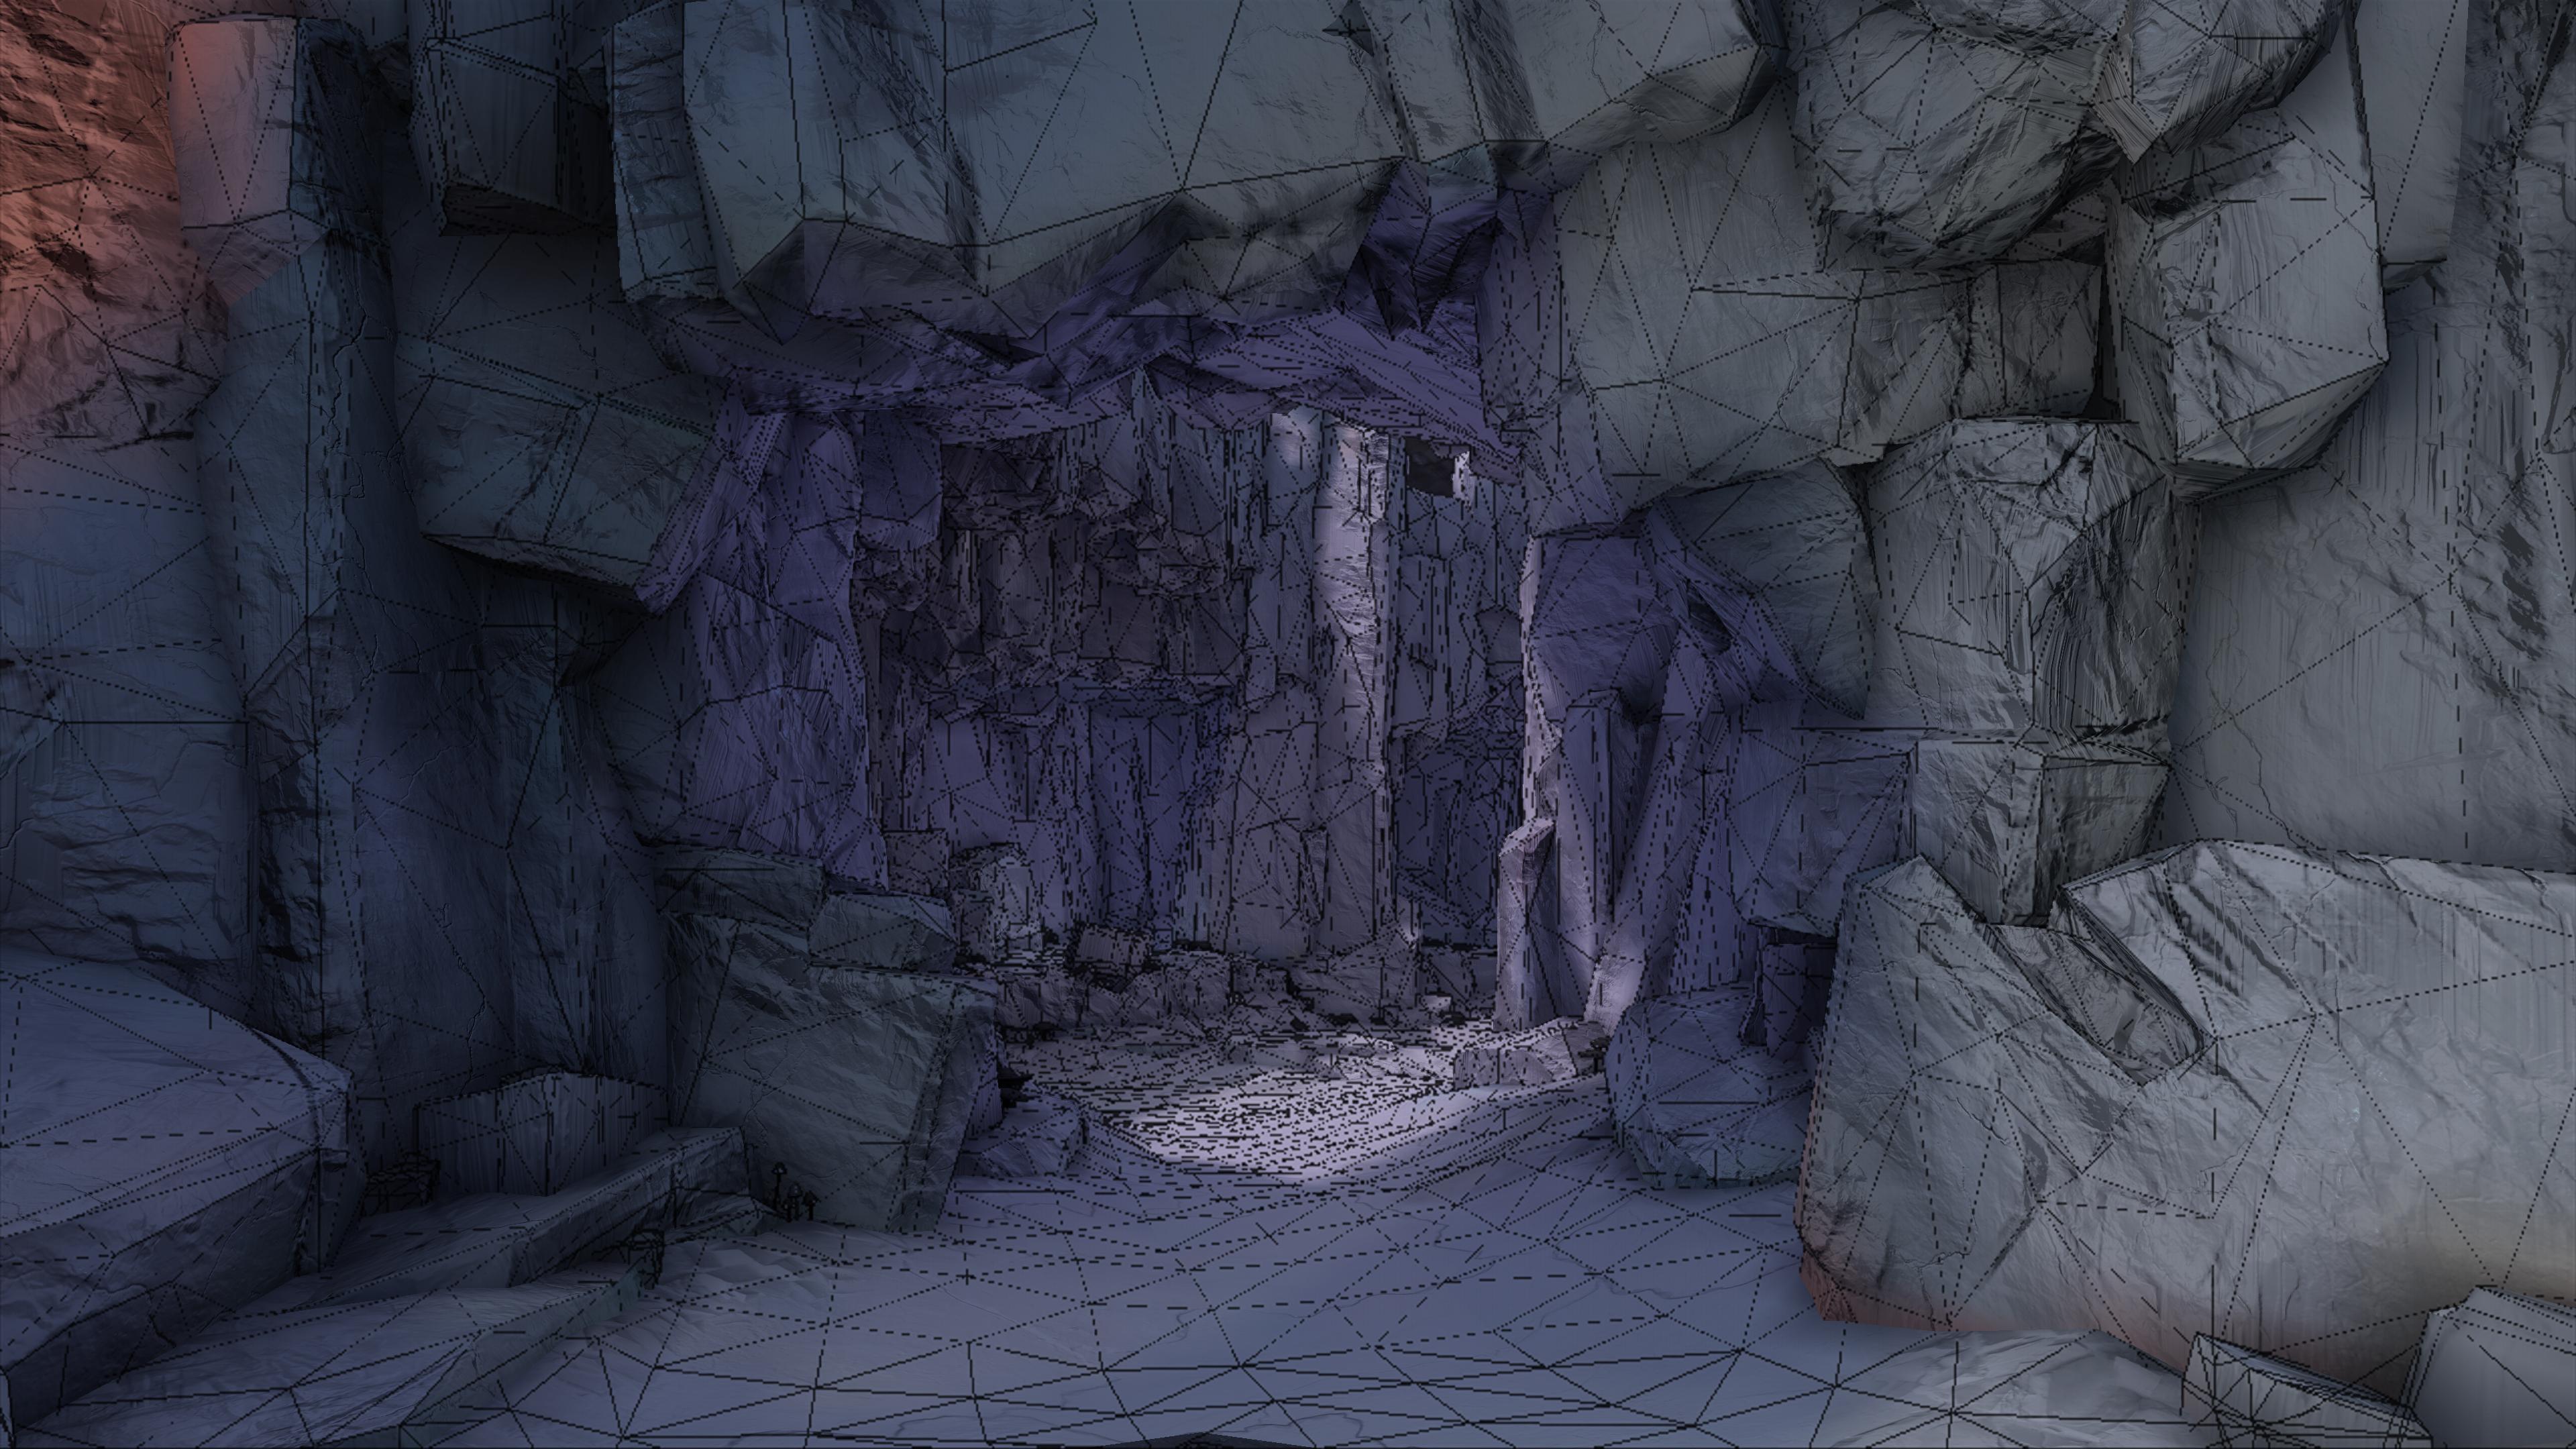 caves013AOWF